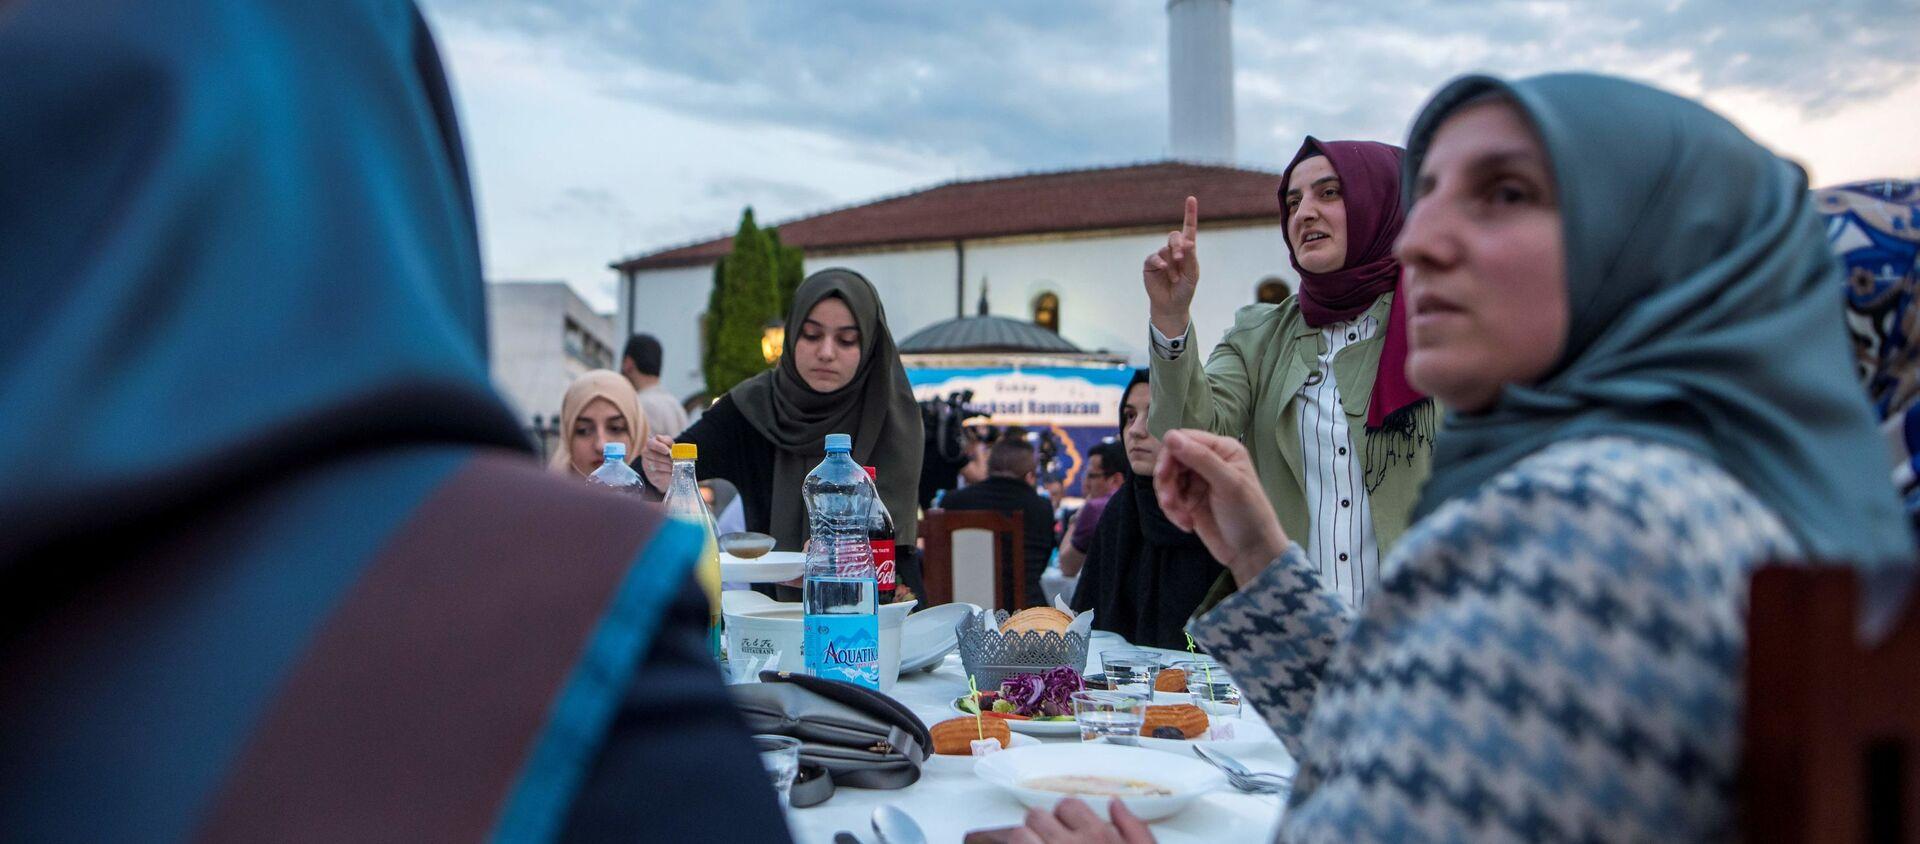 Мусульмане соблюдающие пост в священный месяц Рамазан ждут Азан, фото фото из архива - Sputnik Азербайджан, 1920, 07.04.2021